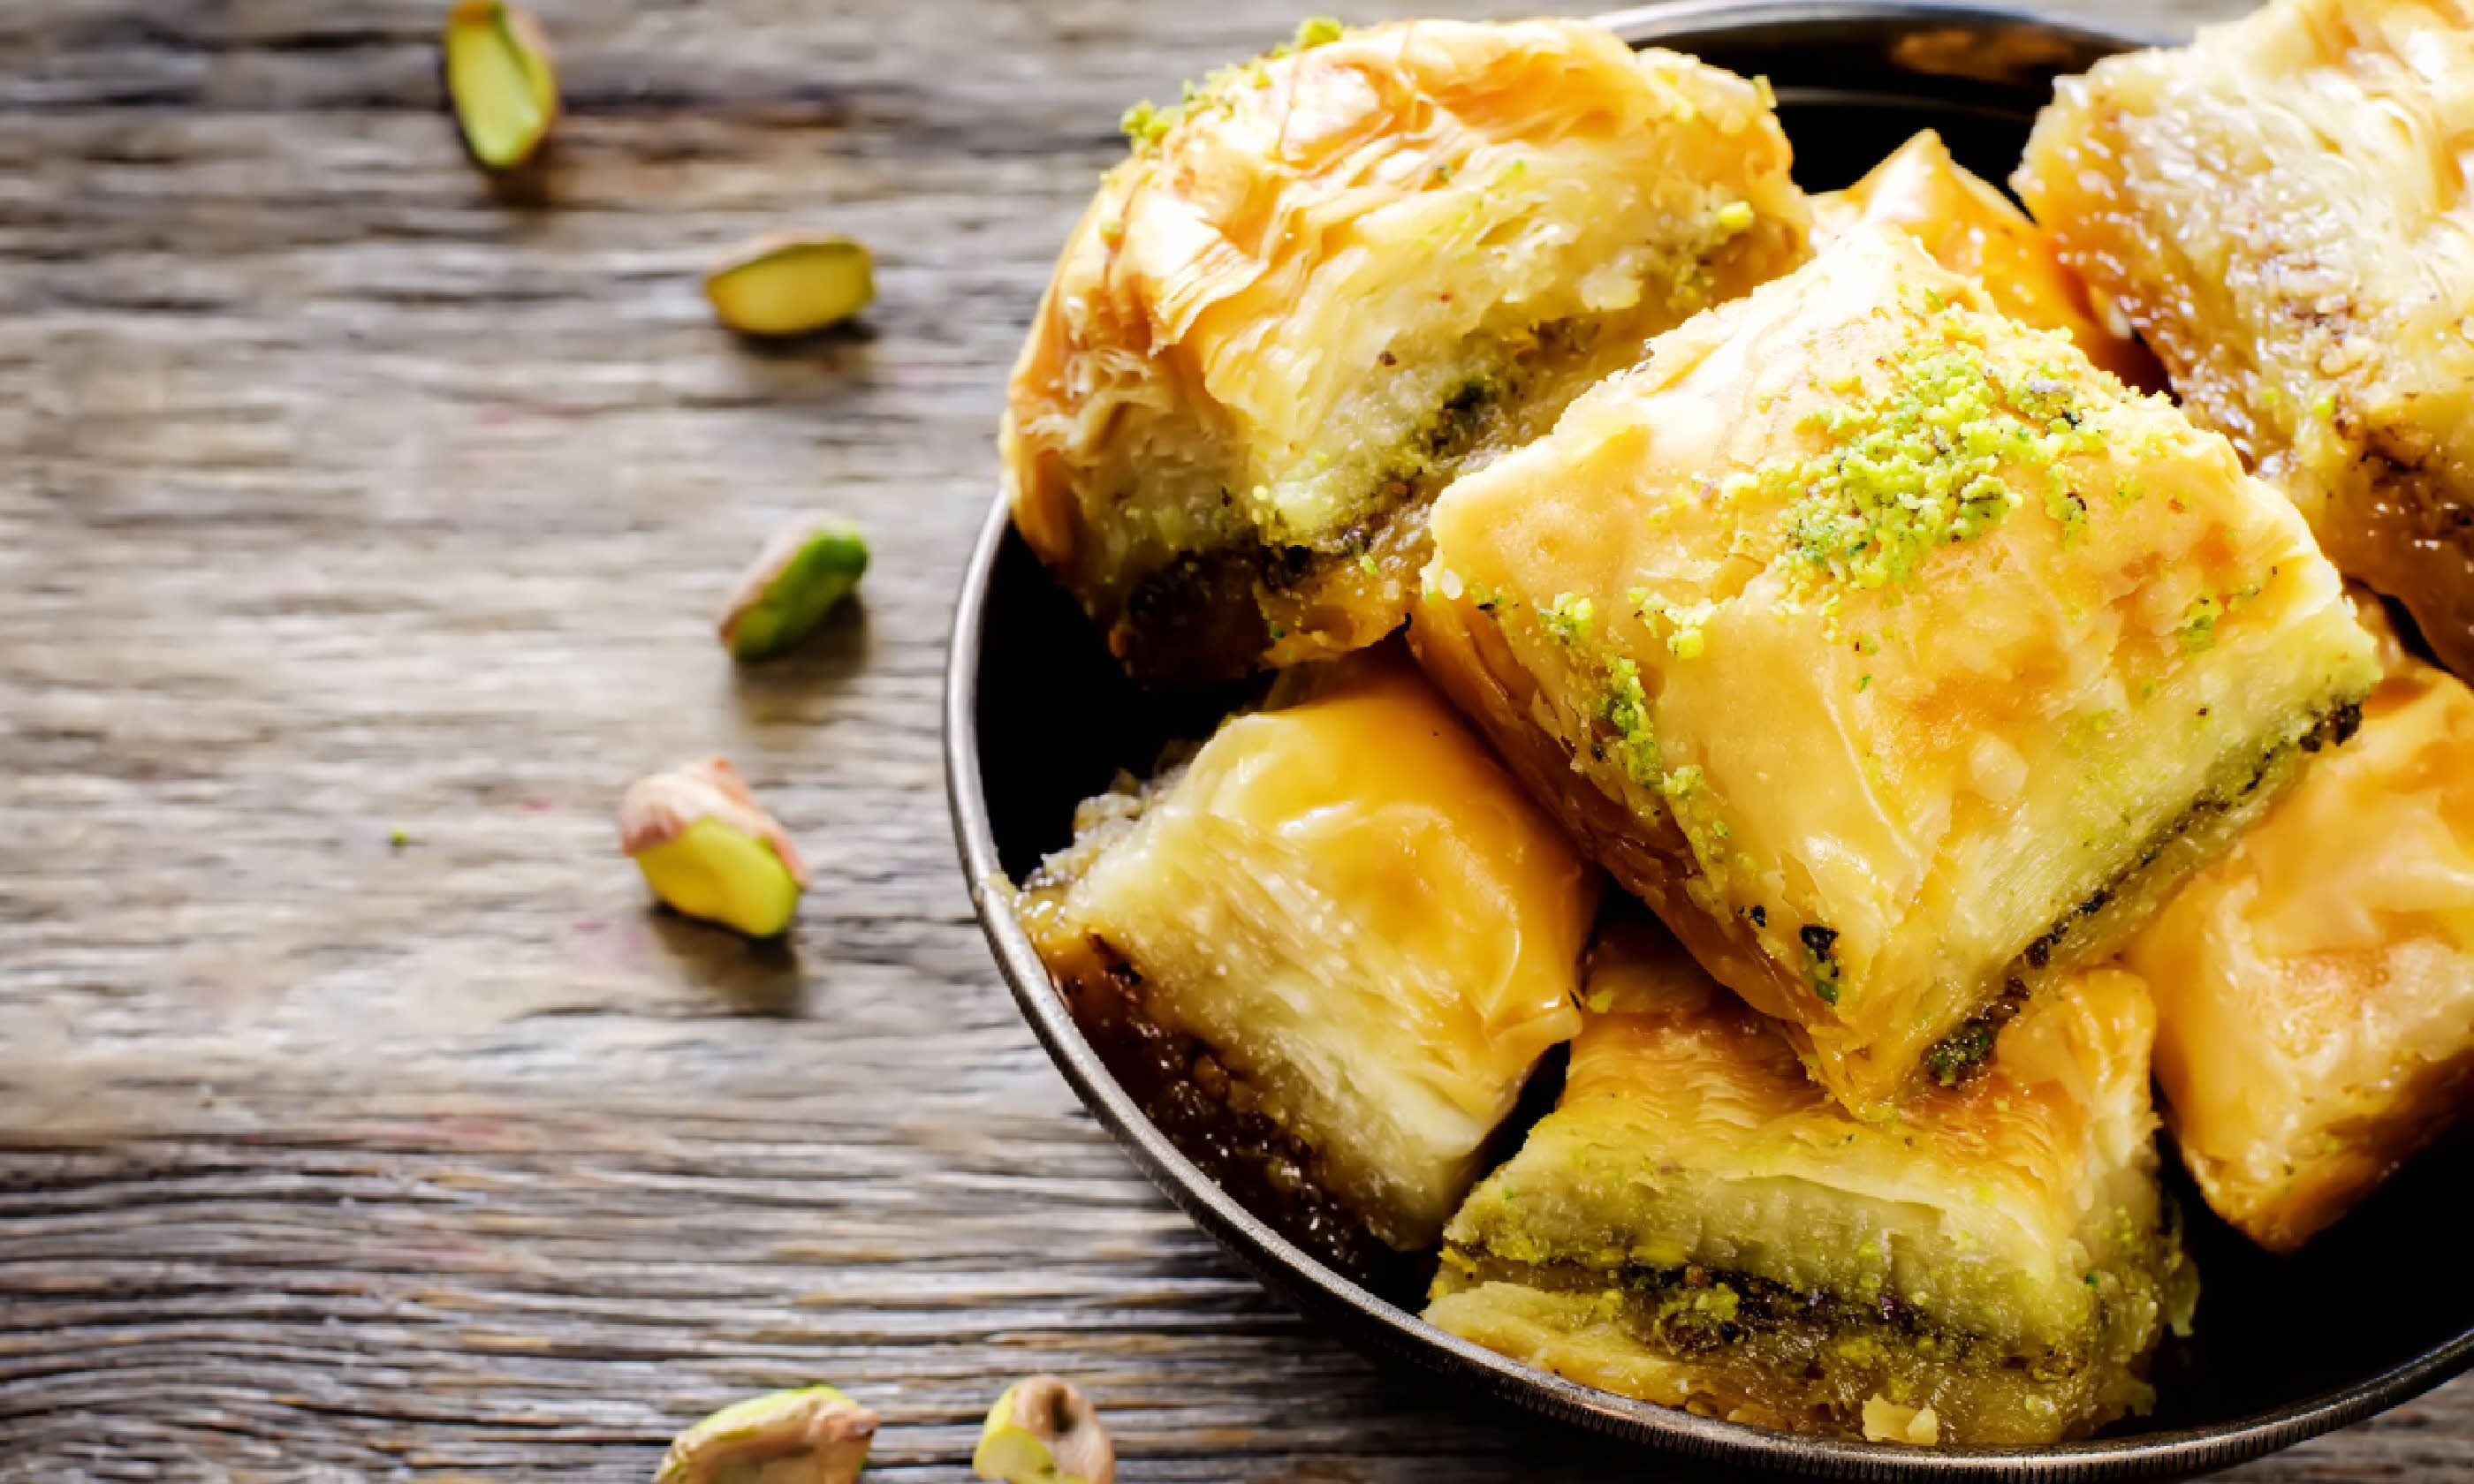 Baklava with pistachio (Shutterstock)